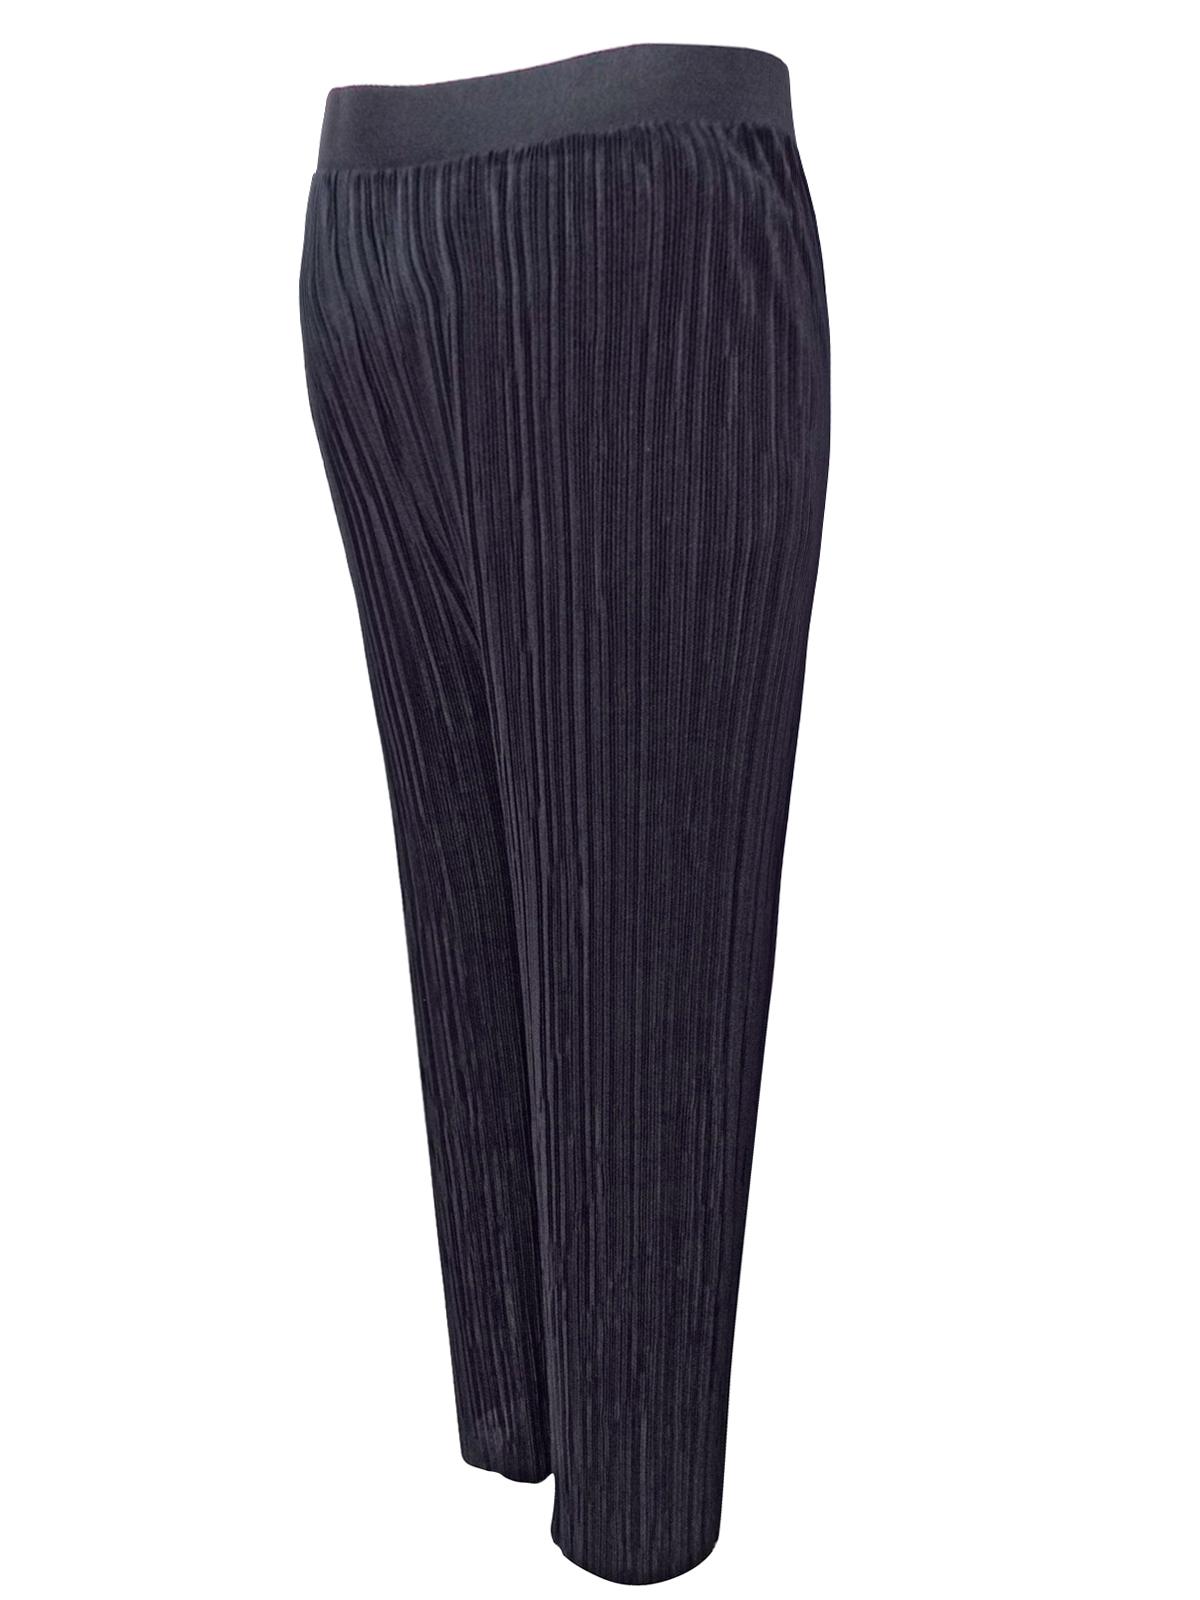 e5a6dbd2cf140 BOOHOO - - B00H00 BLACK Wide Leg Plisse Maternity Trousers - Size 8 to 16